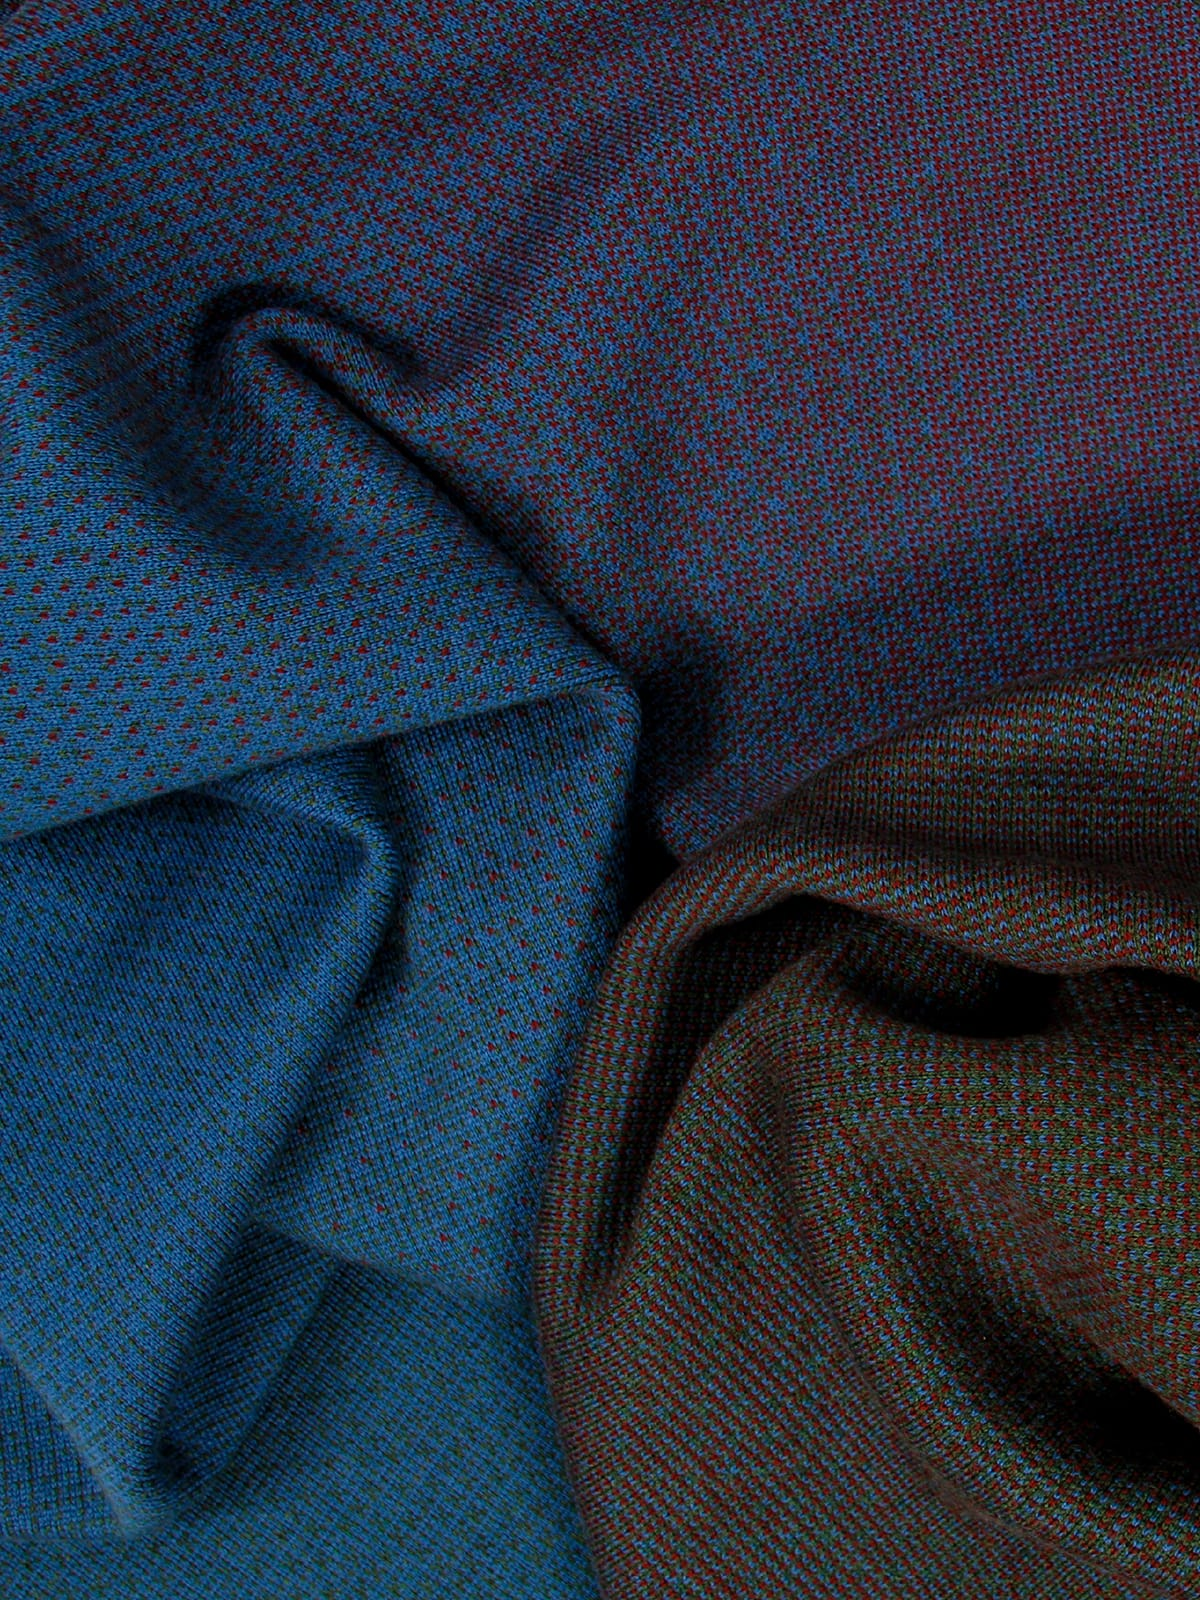 Knitted Blanket Venice - Merino Wool details